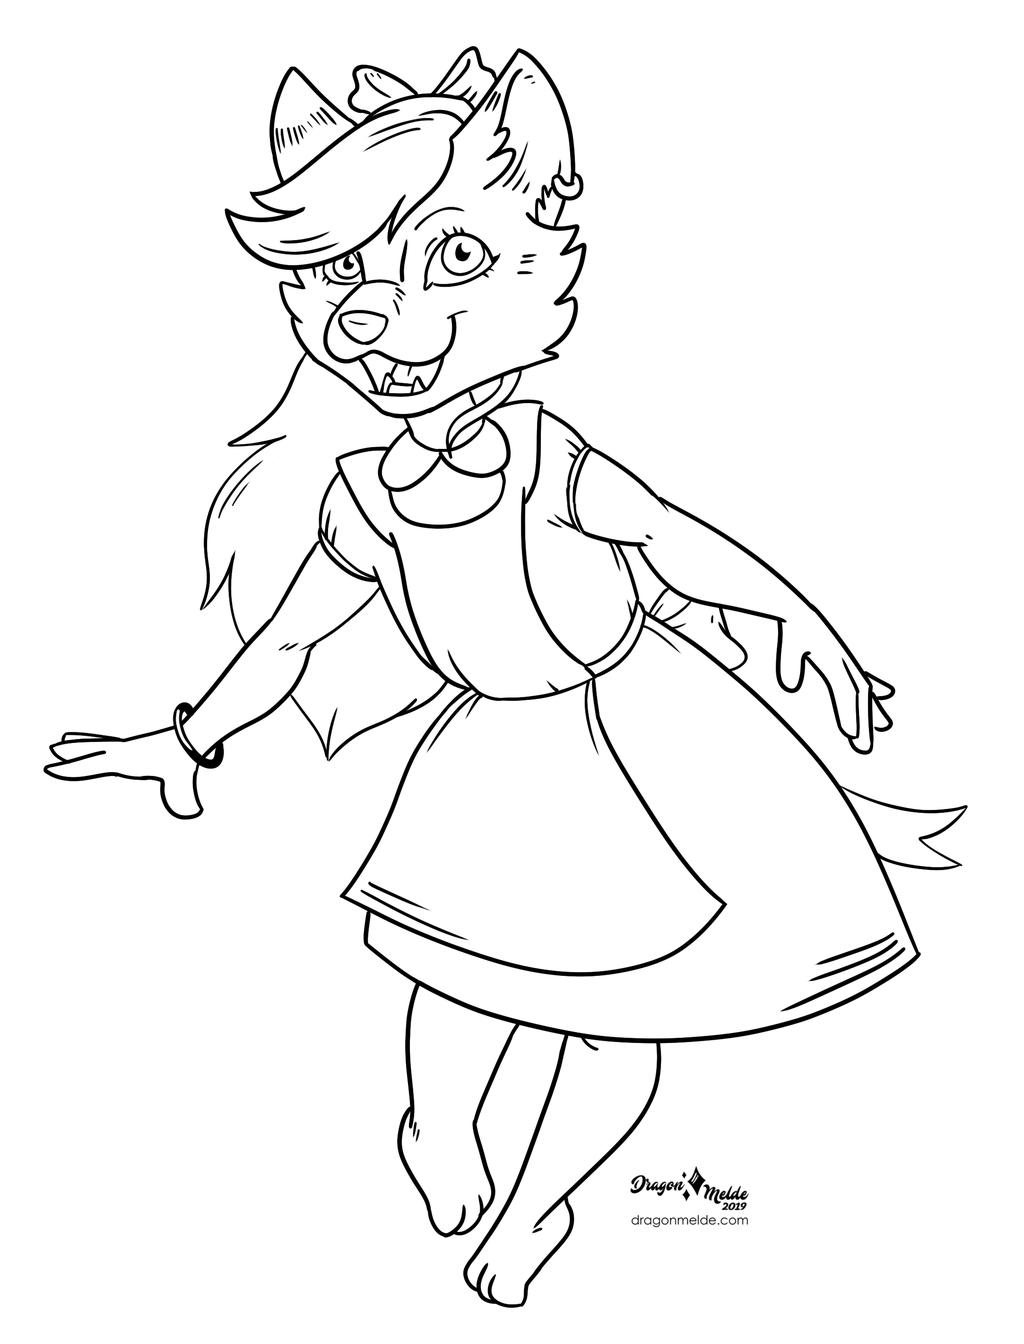 Inktober Commission 21- Alice in Wonderland